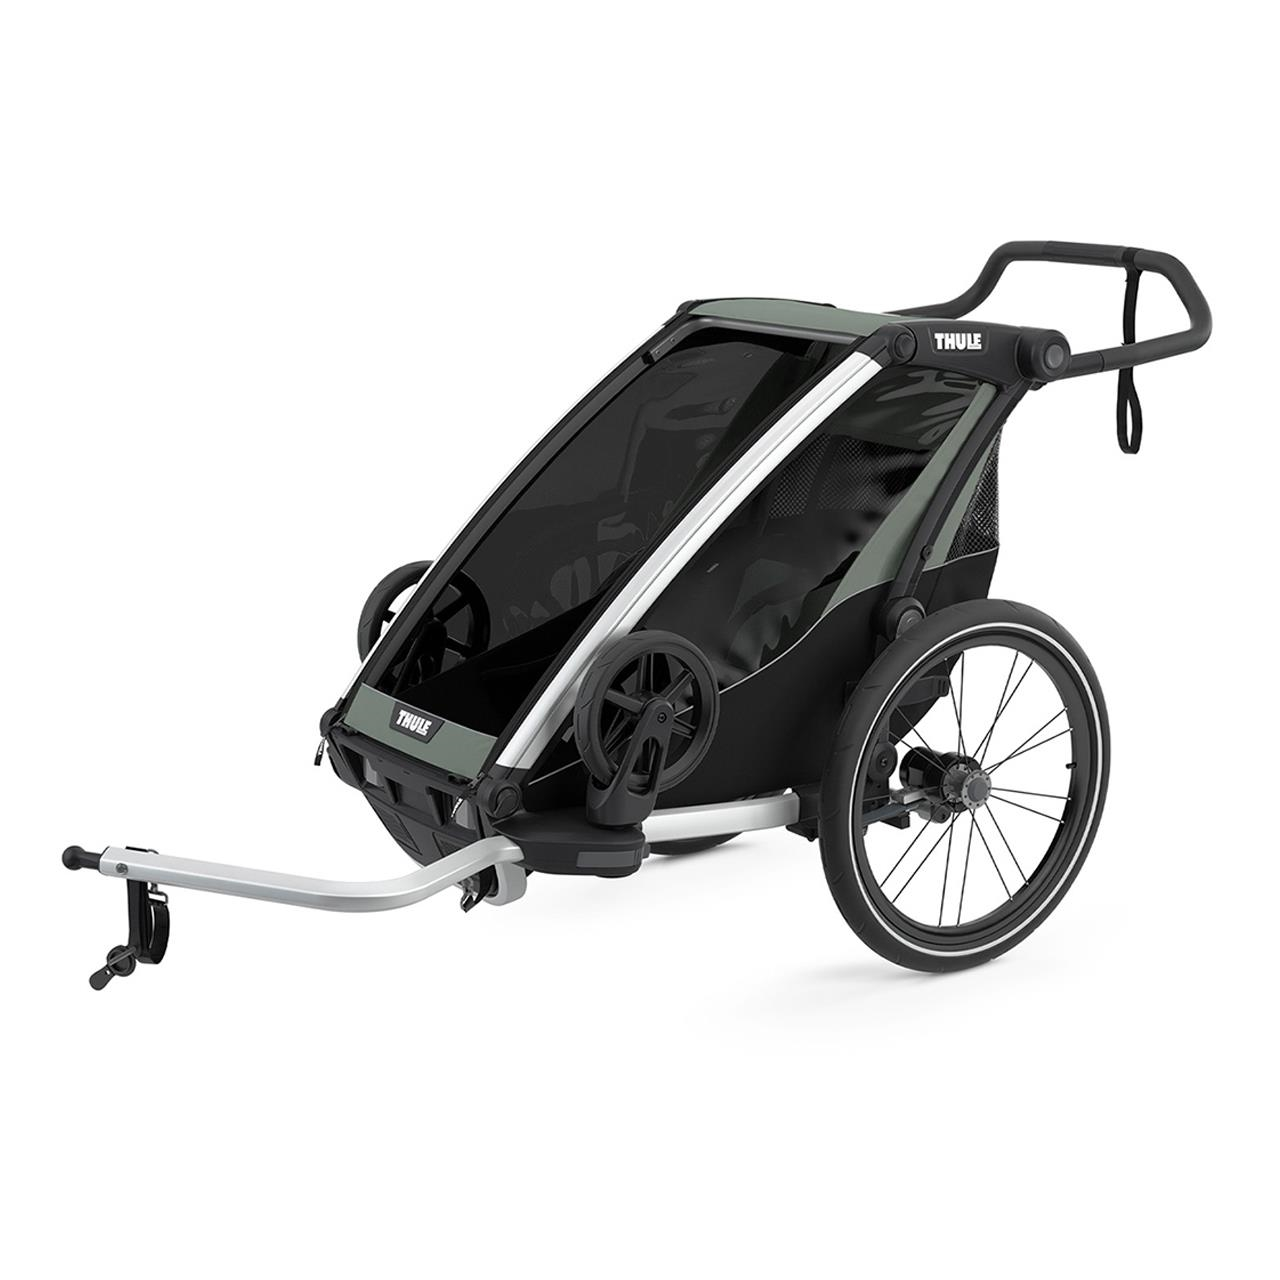 Carucior multisport Thule Chariot Lite 1 Agave